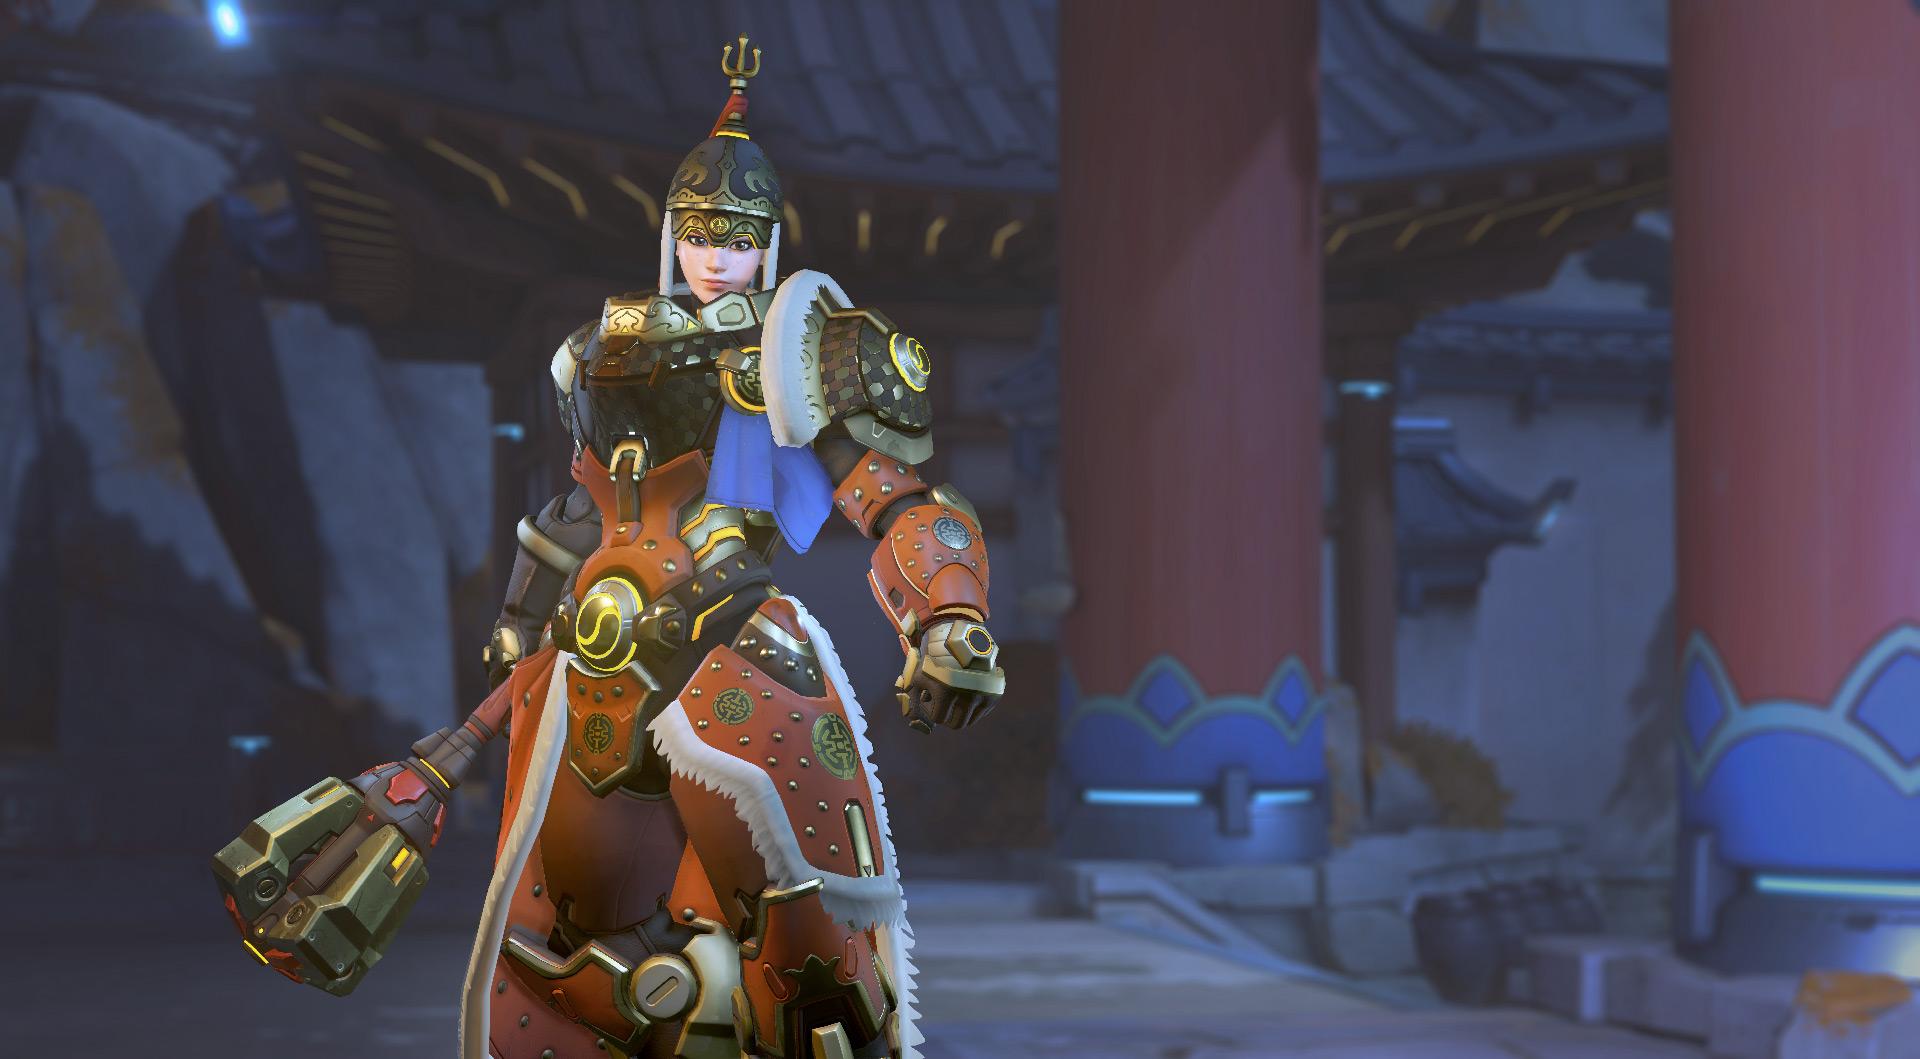 General Brigitte